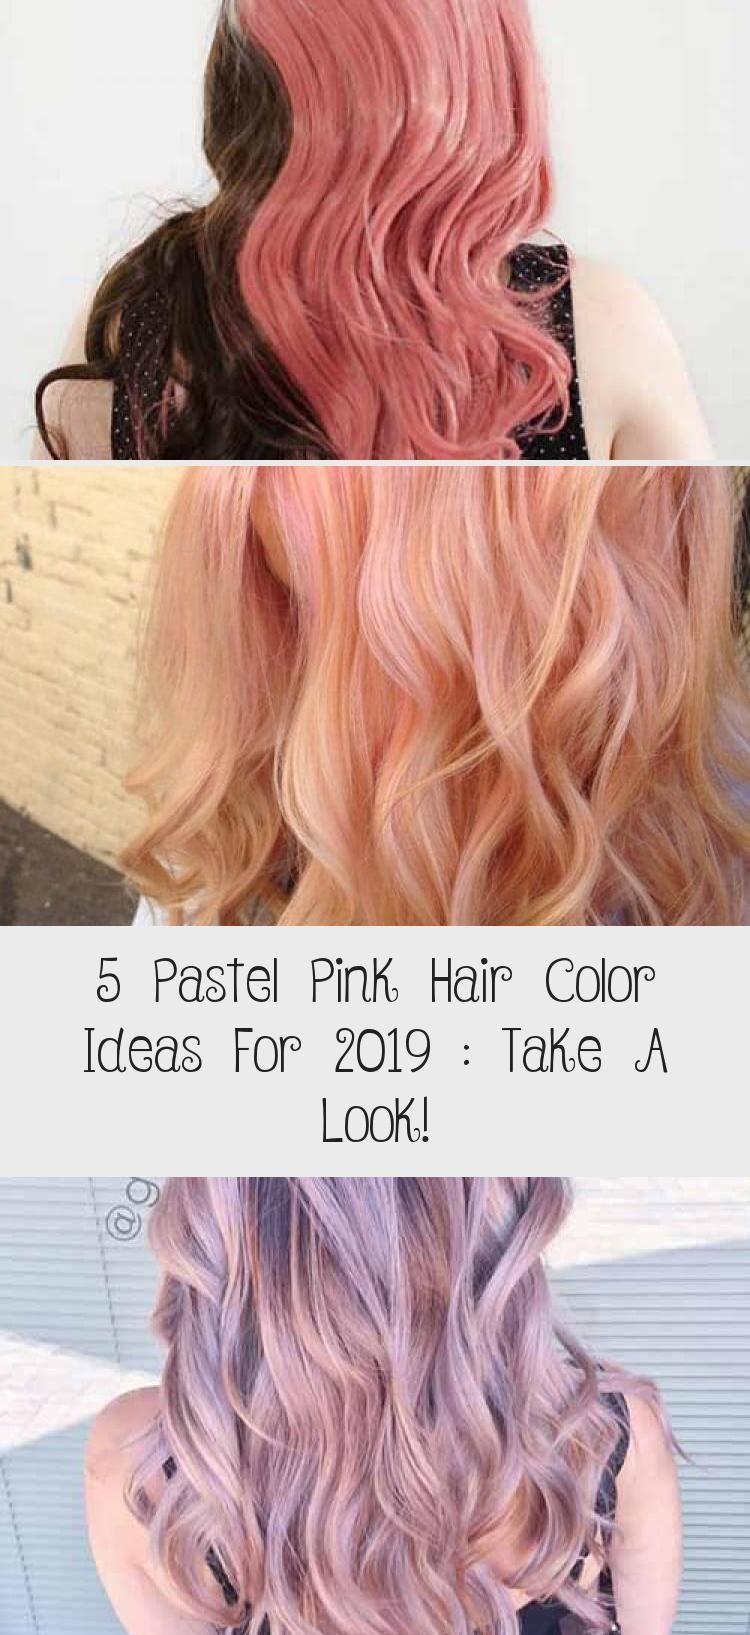 5 Pastel Pink Hair Color Ideas For 2019 Take A Look 100brk Pastellrosa Haarfarben Haarfarbe Ideen